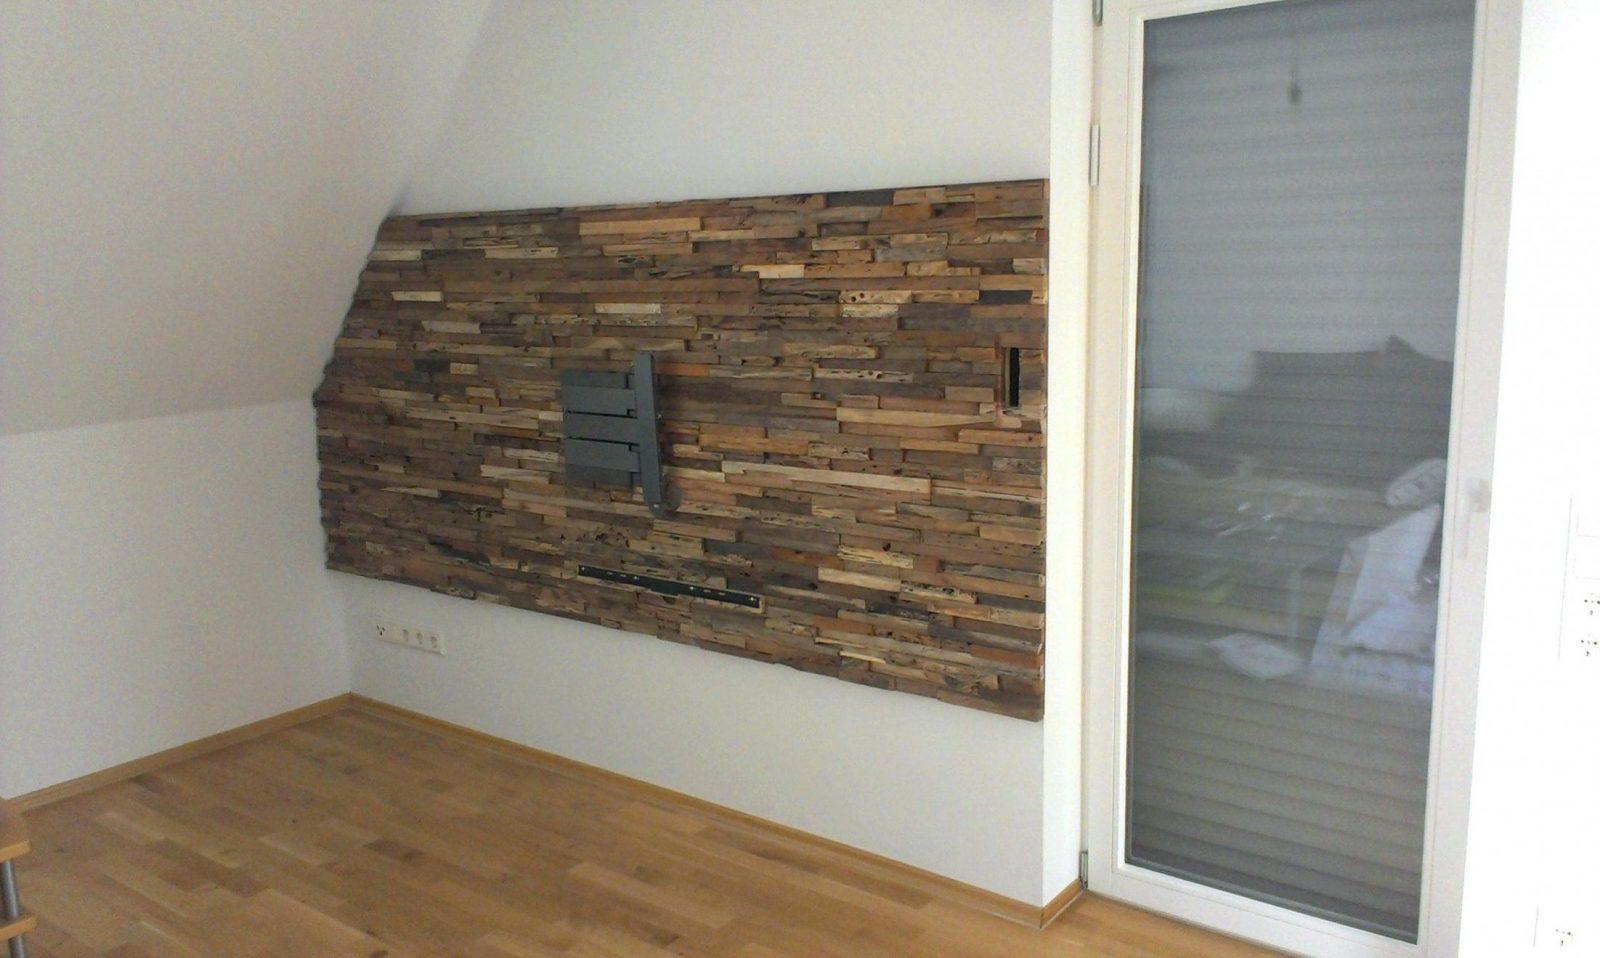 Wandverkleidung Holz Selber Bauen Wandverkleidungen Granit von Wandverkleidung Holz Selber Bauen Photo